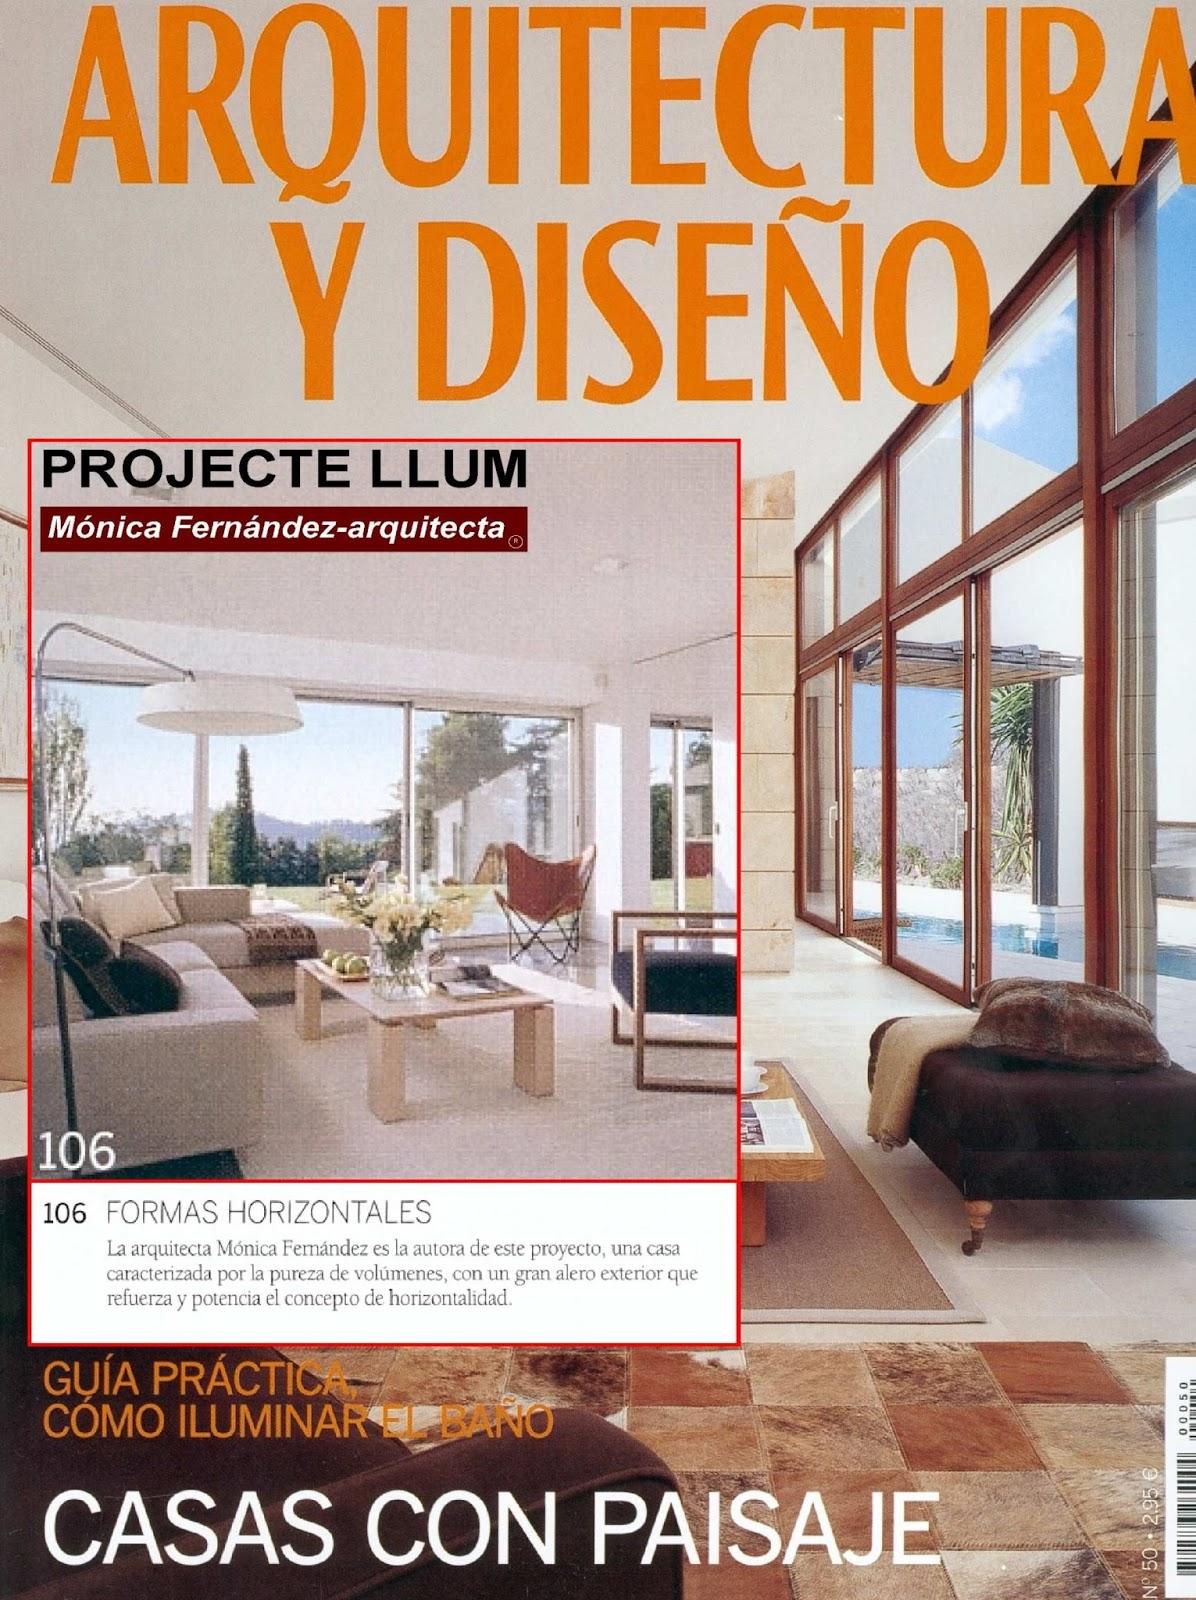 Revista de arquitectura y dise o for Revista habitat arquitectura diseno interiorismo